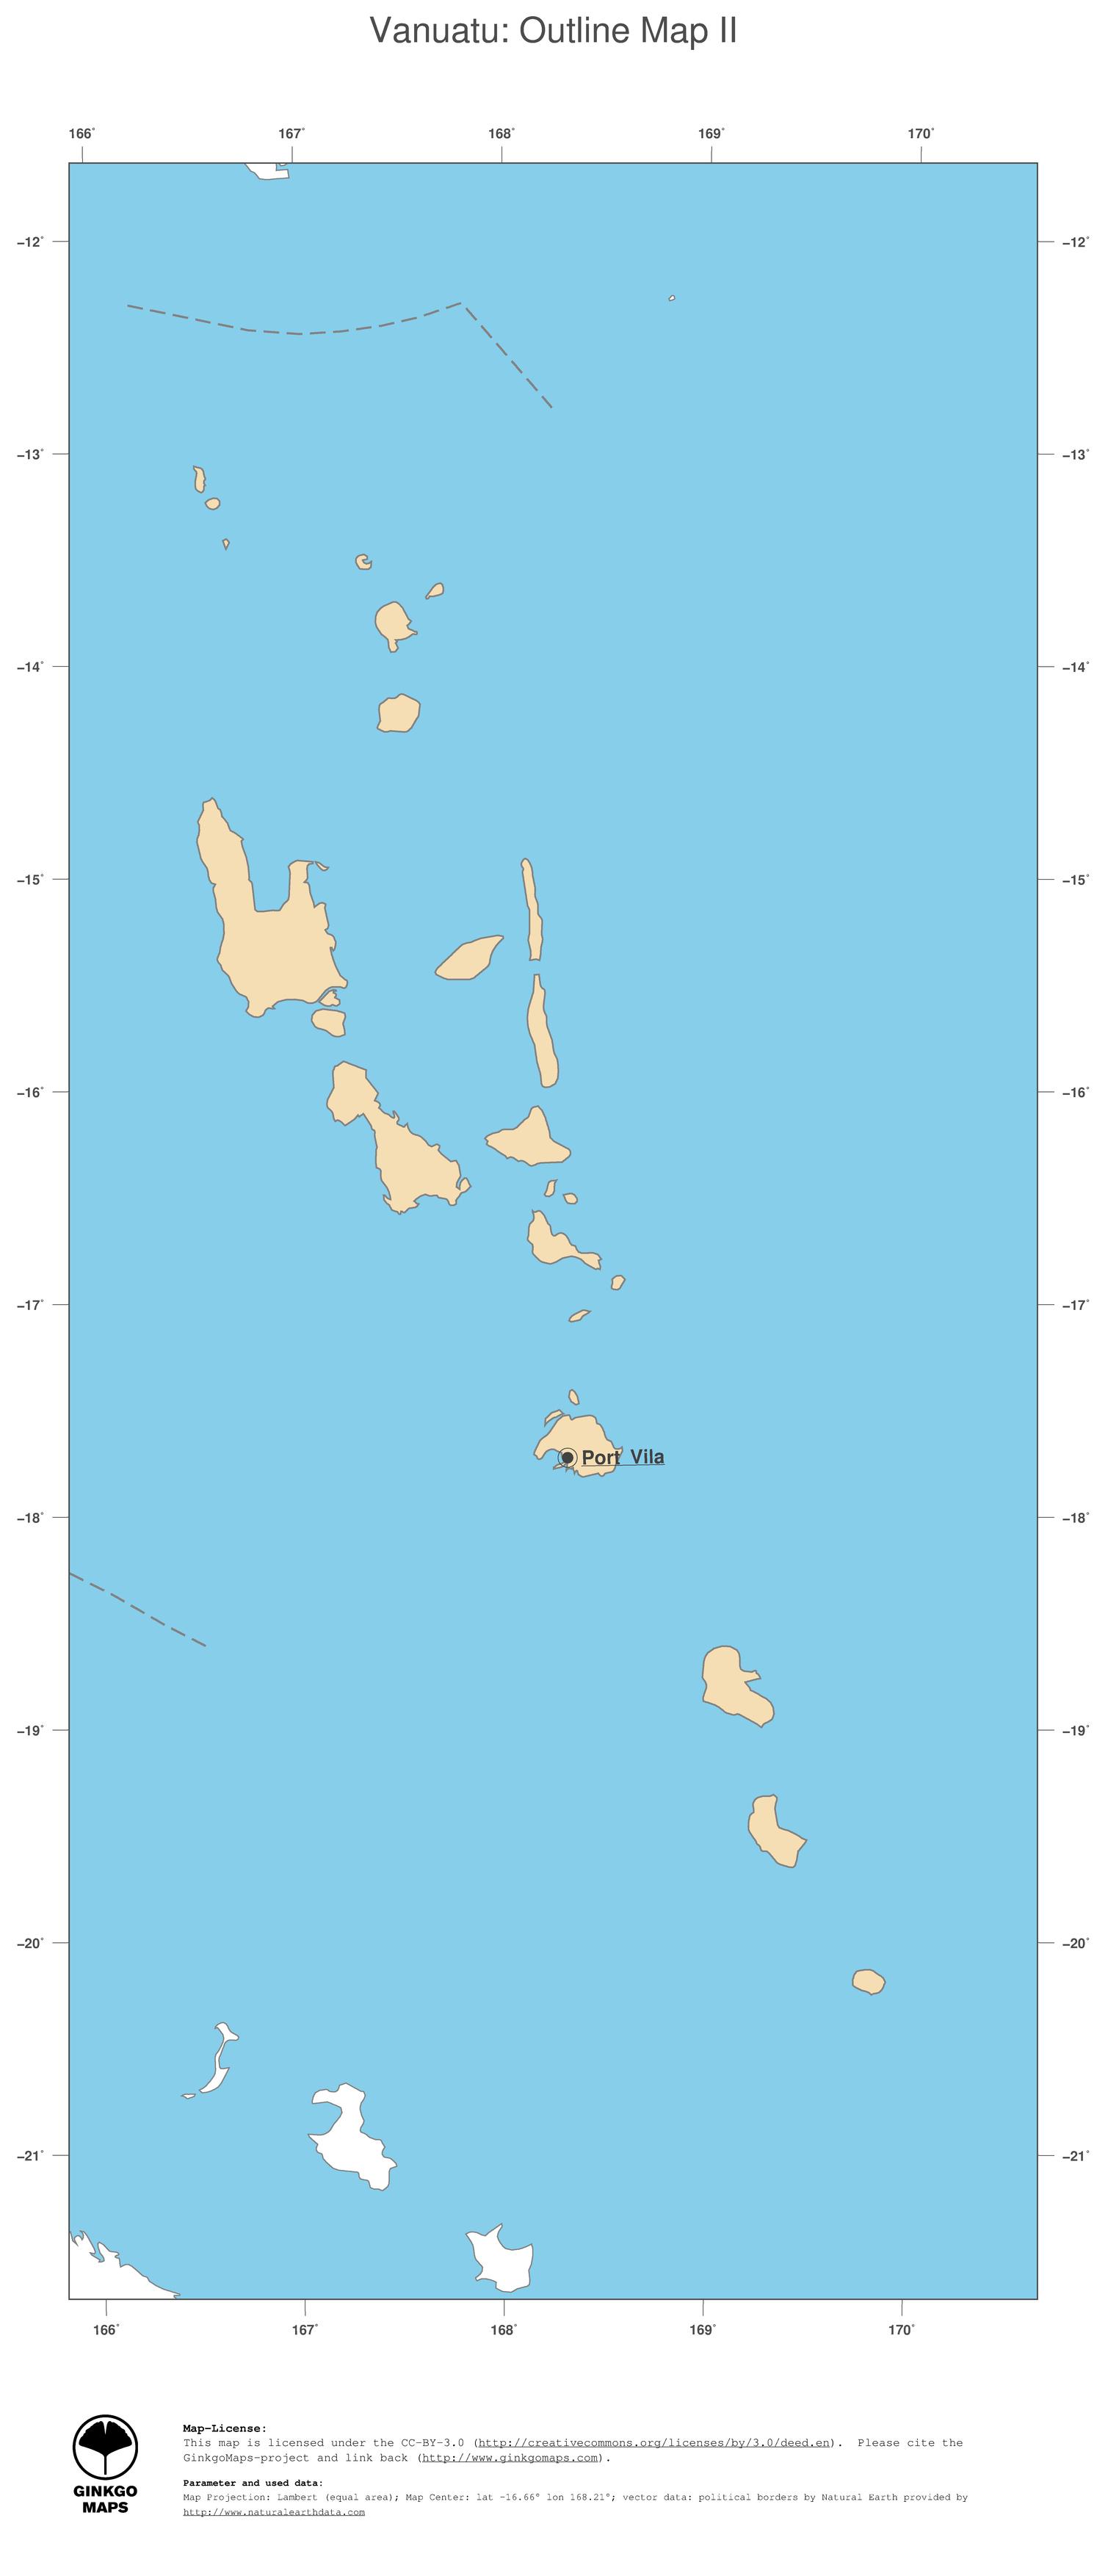 Map Vanuatu; GinkgoMaps continent: Oceania; region: Vanuatu